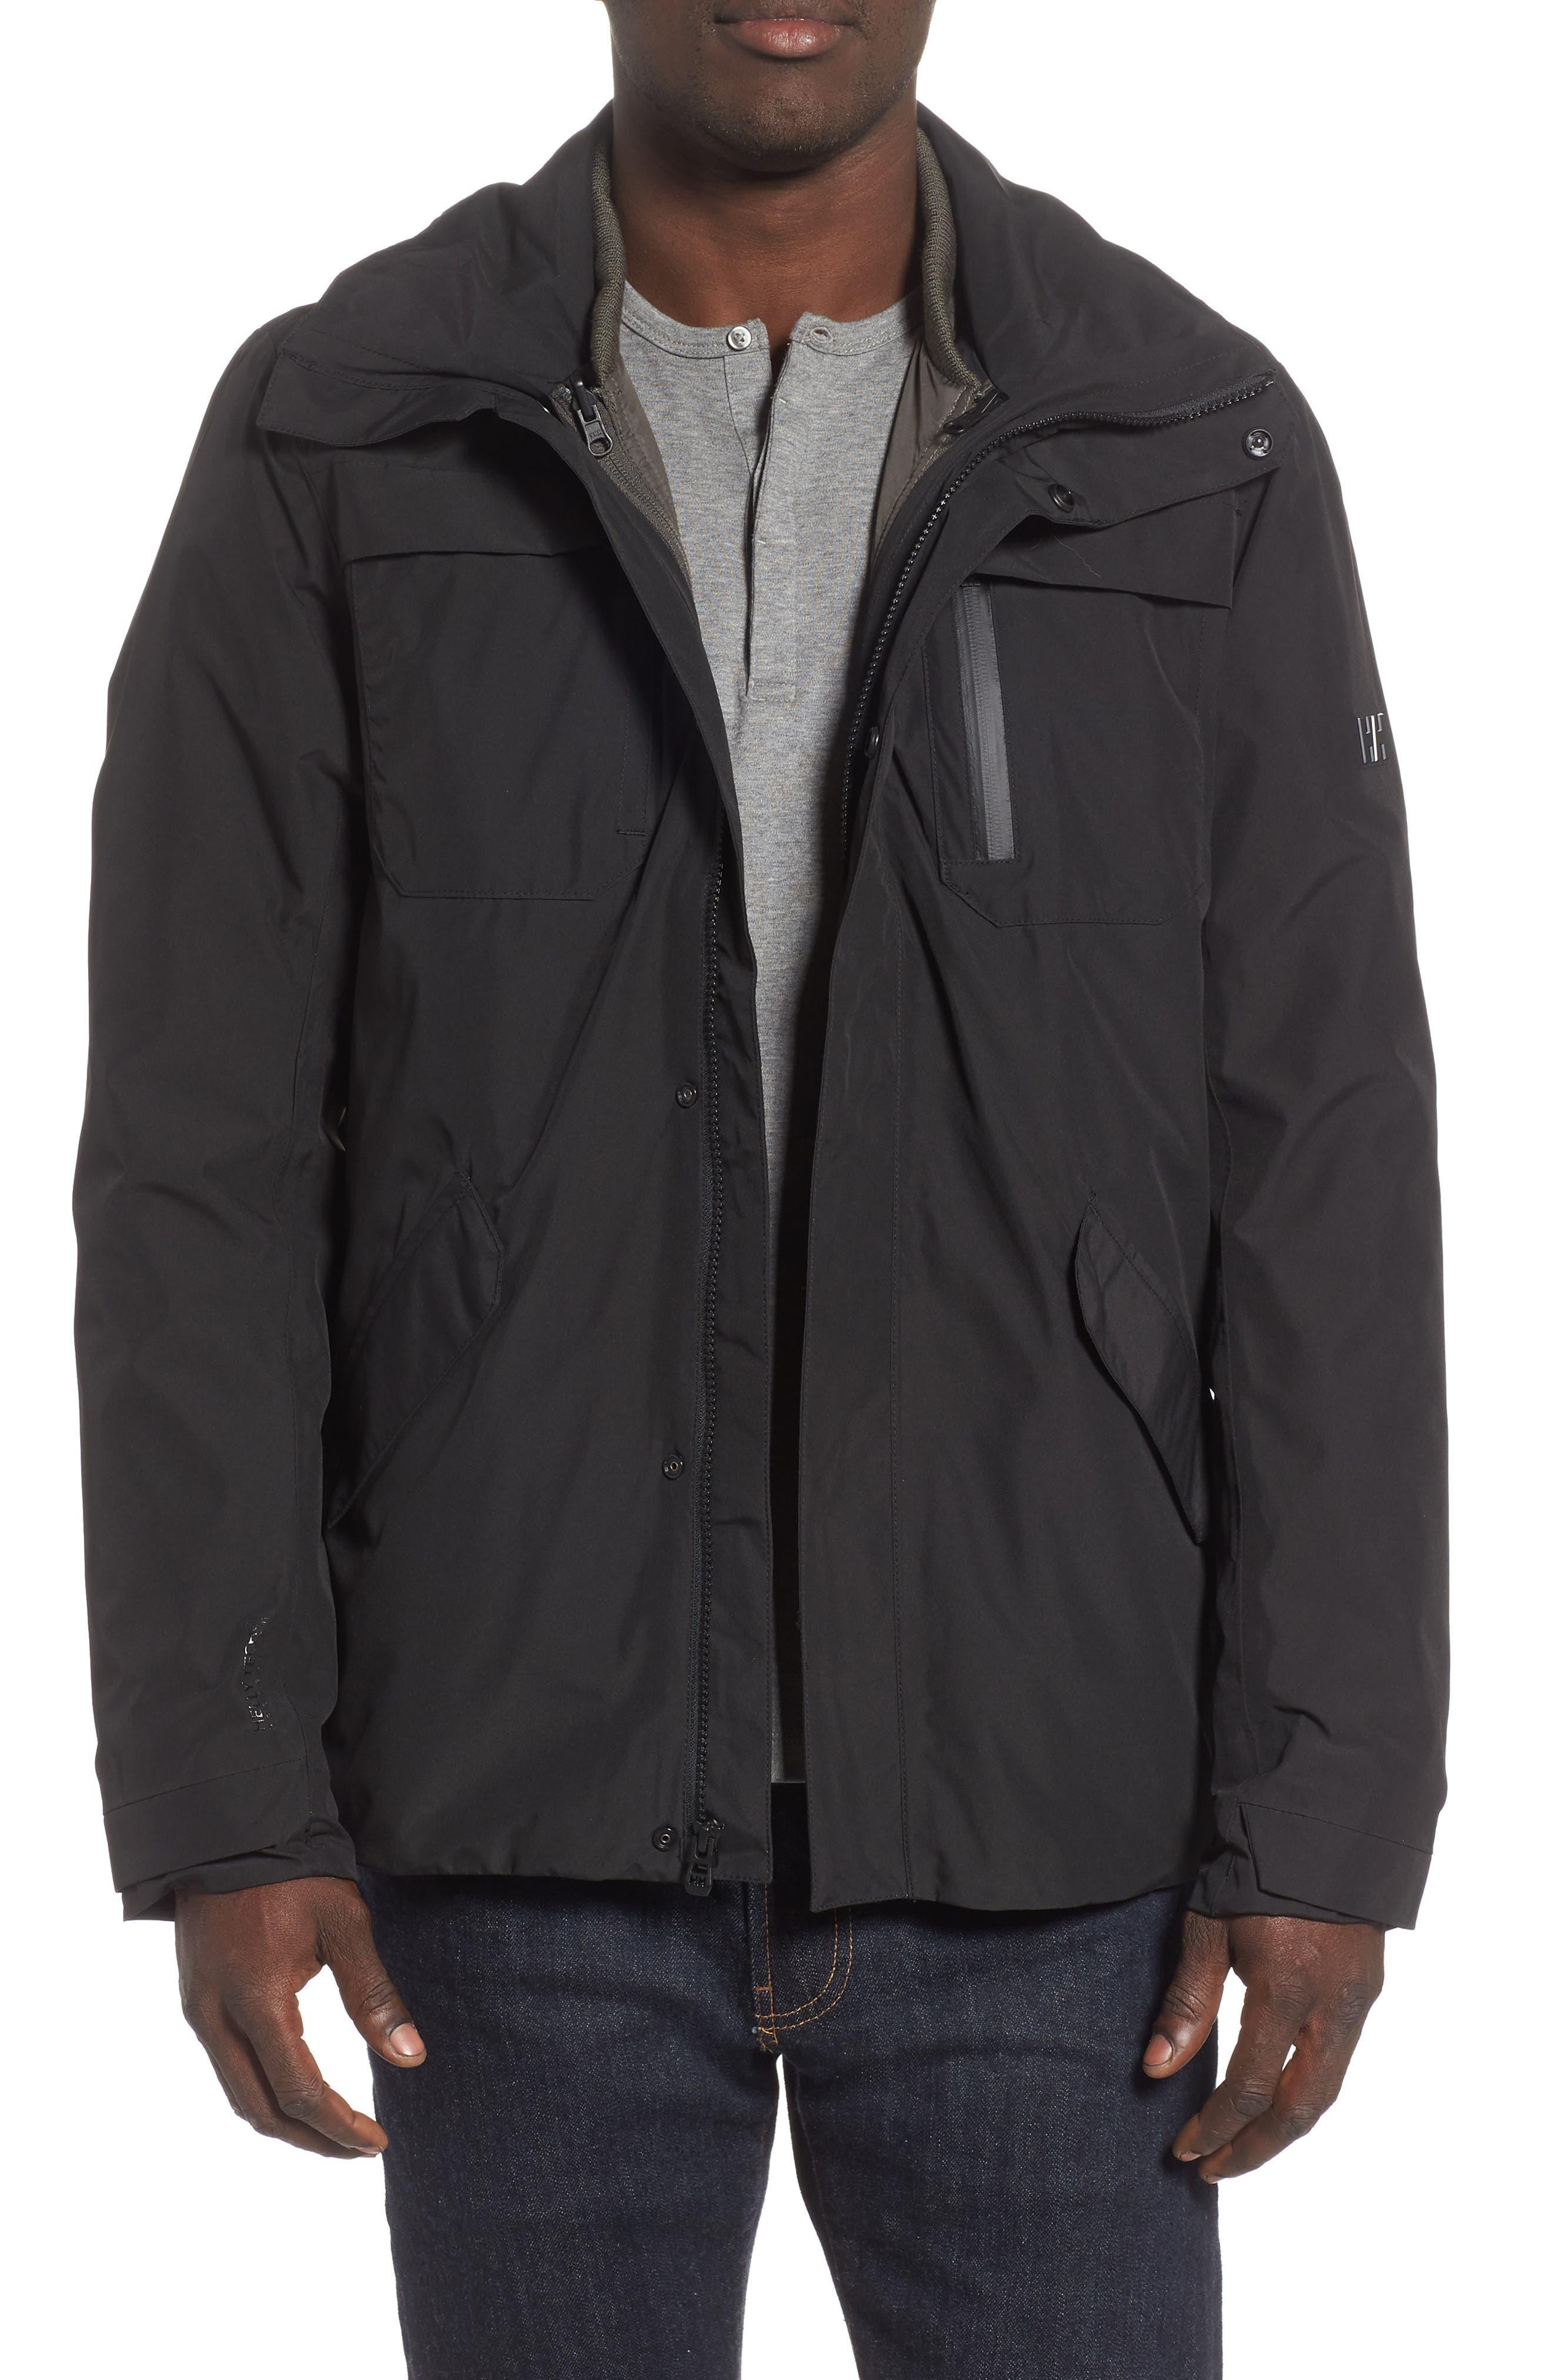 Helly Hansen Reykjavik Regular Fit Waterproof Primaloft 3-In-1 Jacket